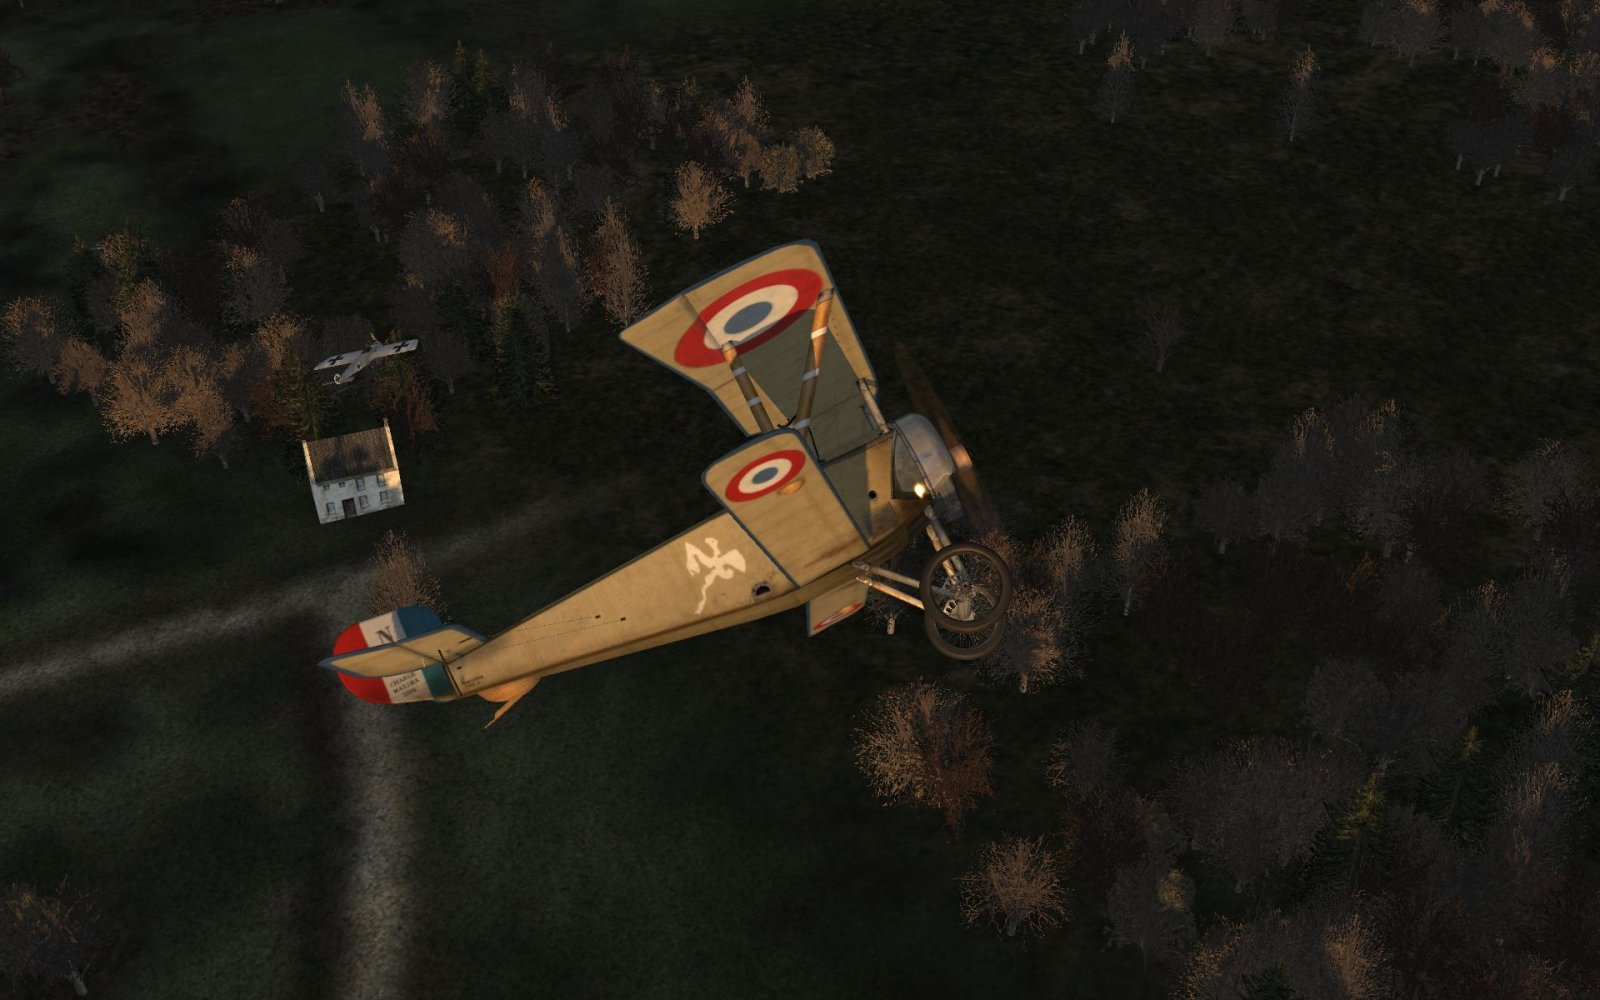 Nieuport11-11-16-11-47-38.jpg